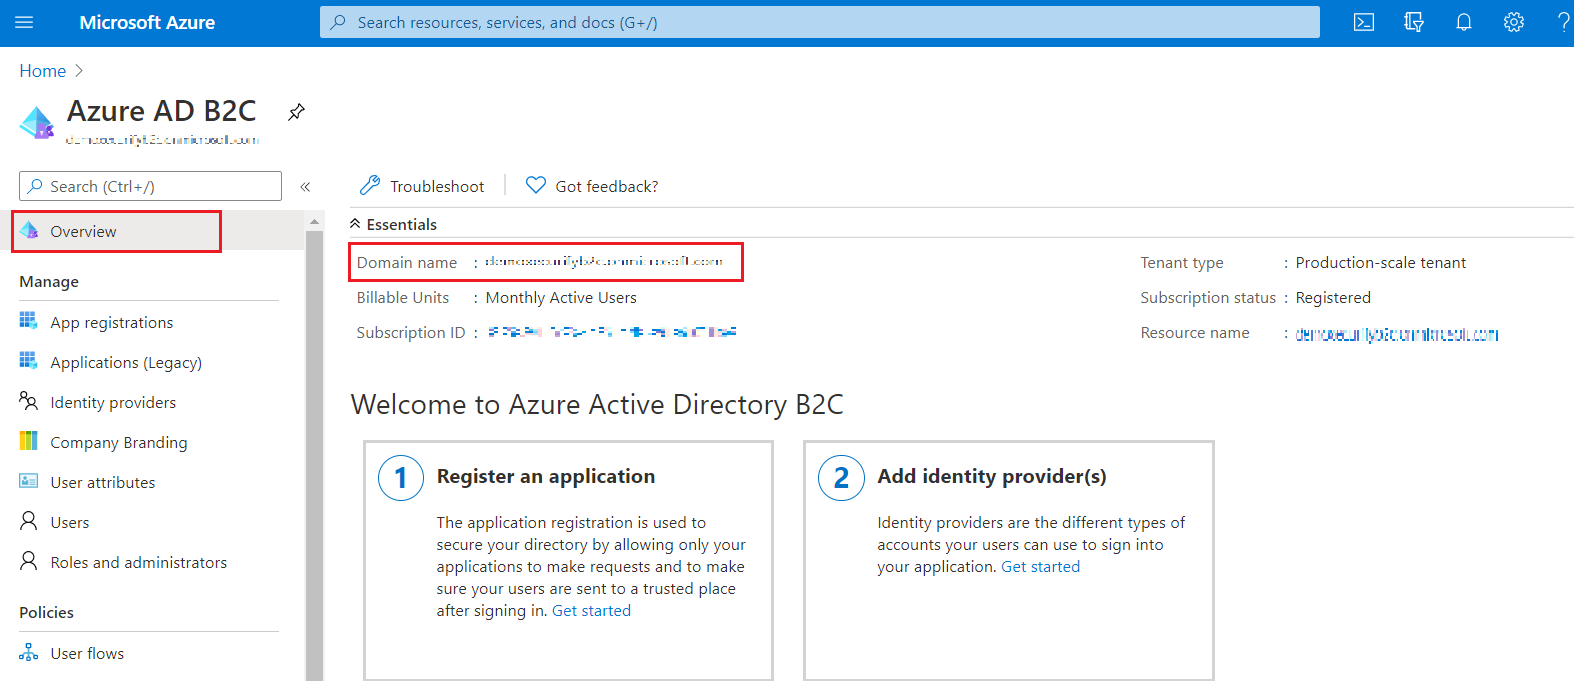 SAML Single Sign-On (SSO) using Azure B2C as Identity Provider (IdP),for SAML 2.0 Azure B2C, B2C tenant ID Reco